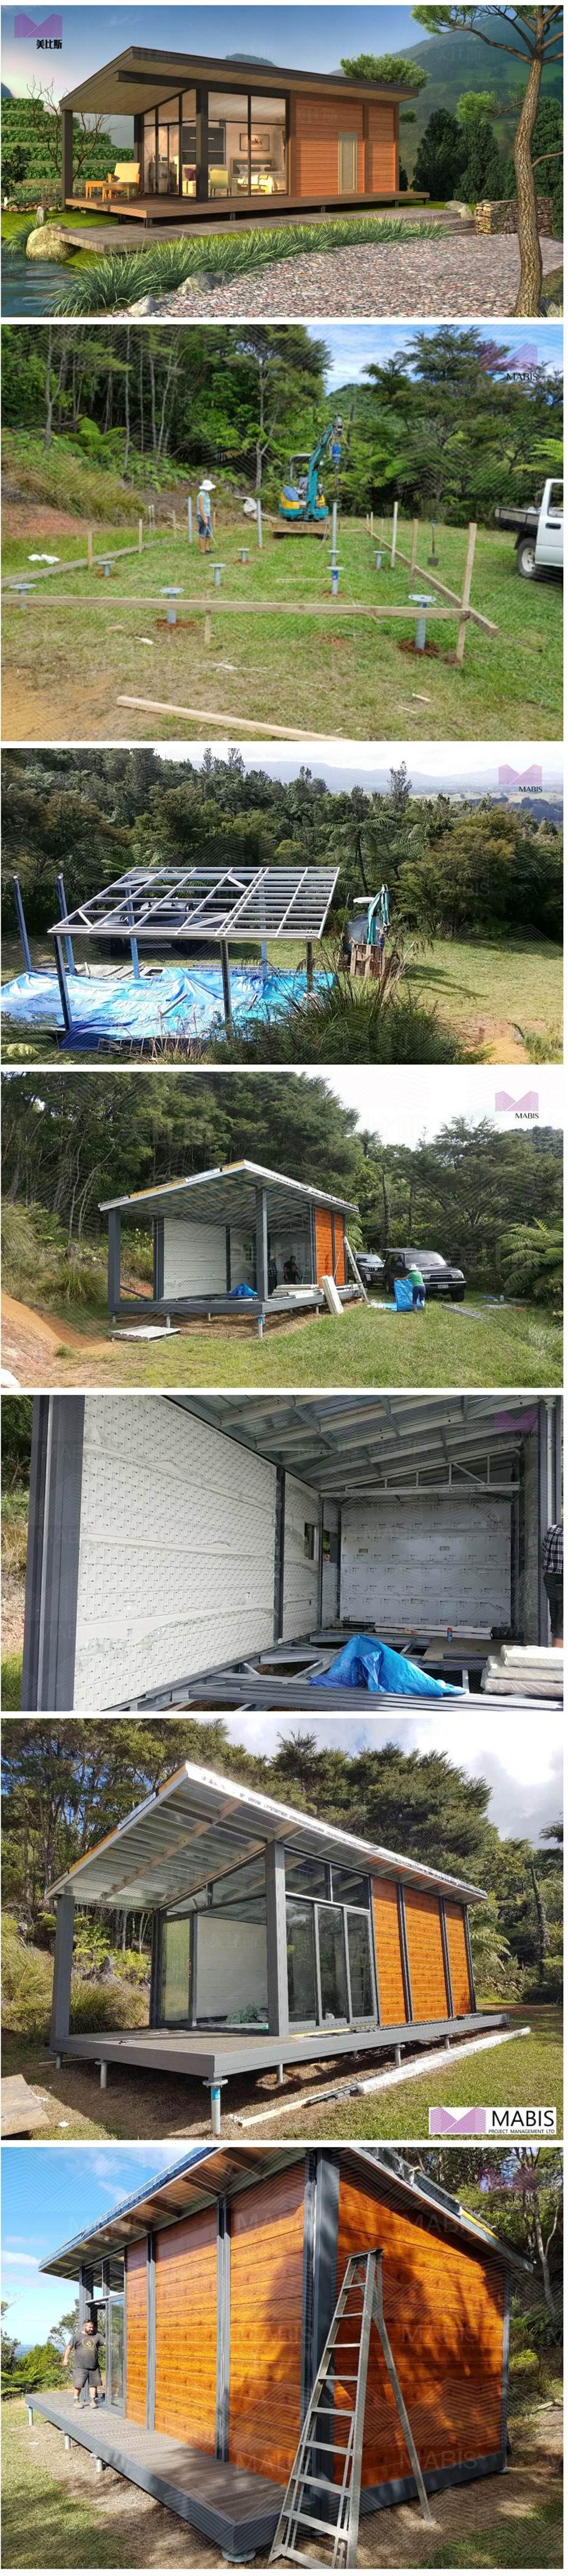 prefab house_modular house_tiny house_resort villa_beach villa_New Zealand